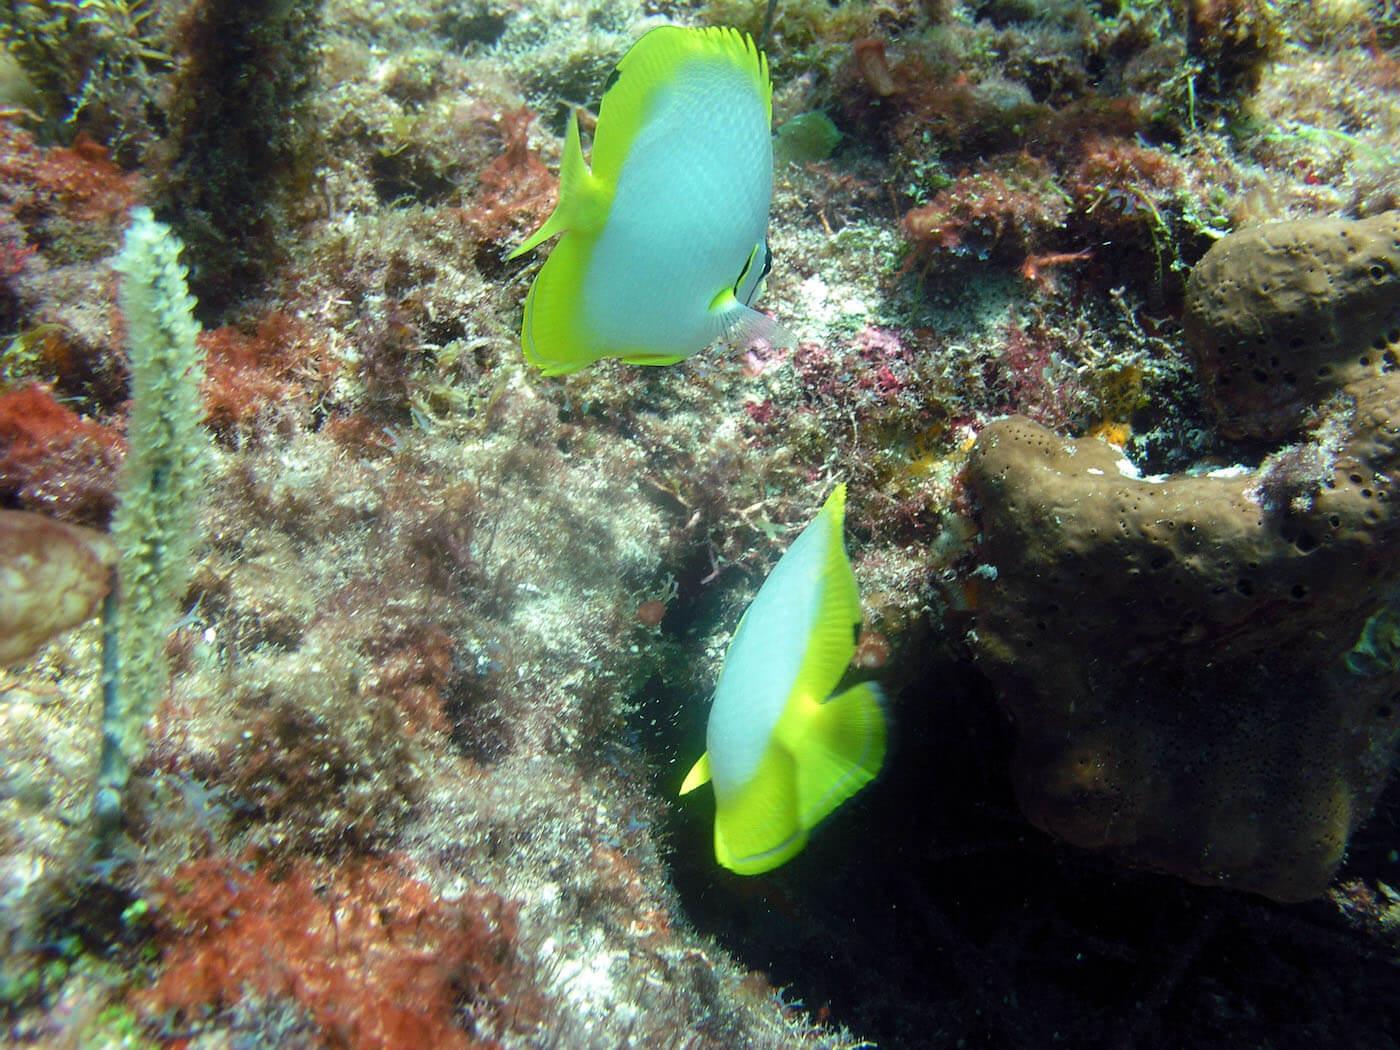 Isla Mujeres Scuba Diving Snorkeling Manchones Reef Squalo Adventures-49